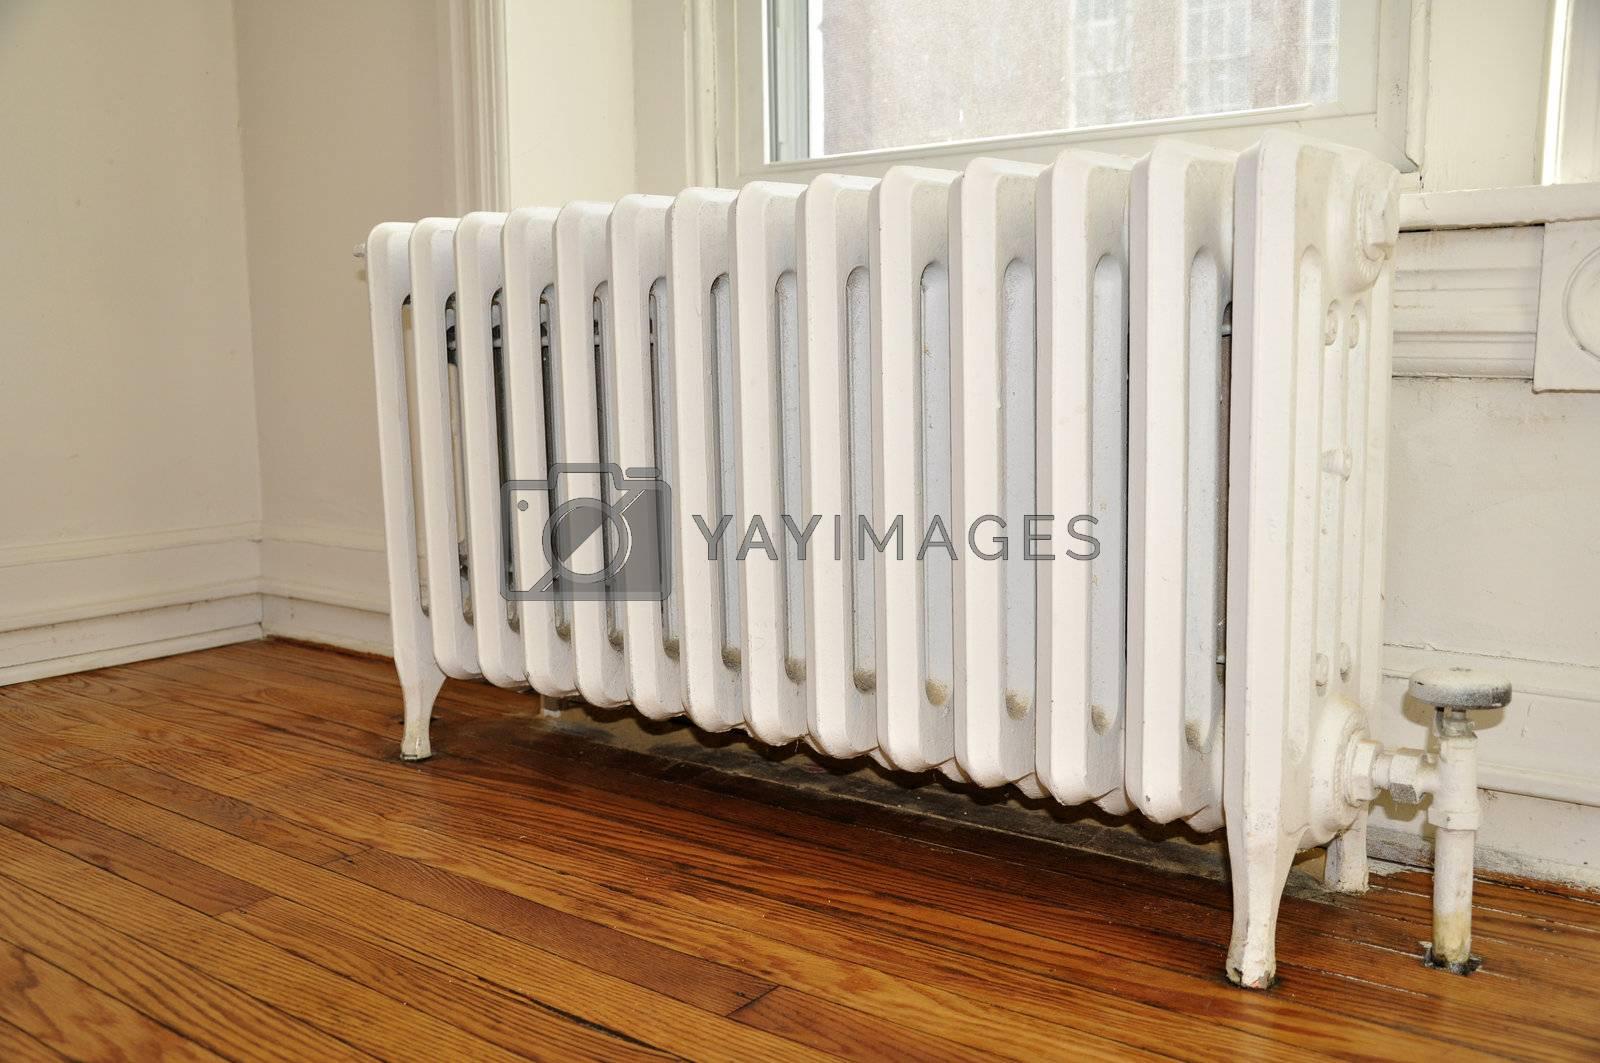 Royalty free image of white radiator by cfarmer